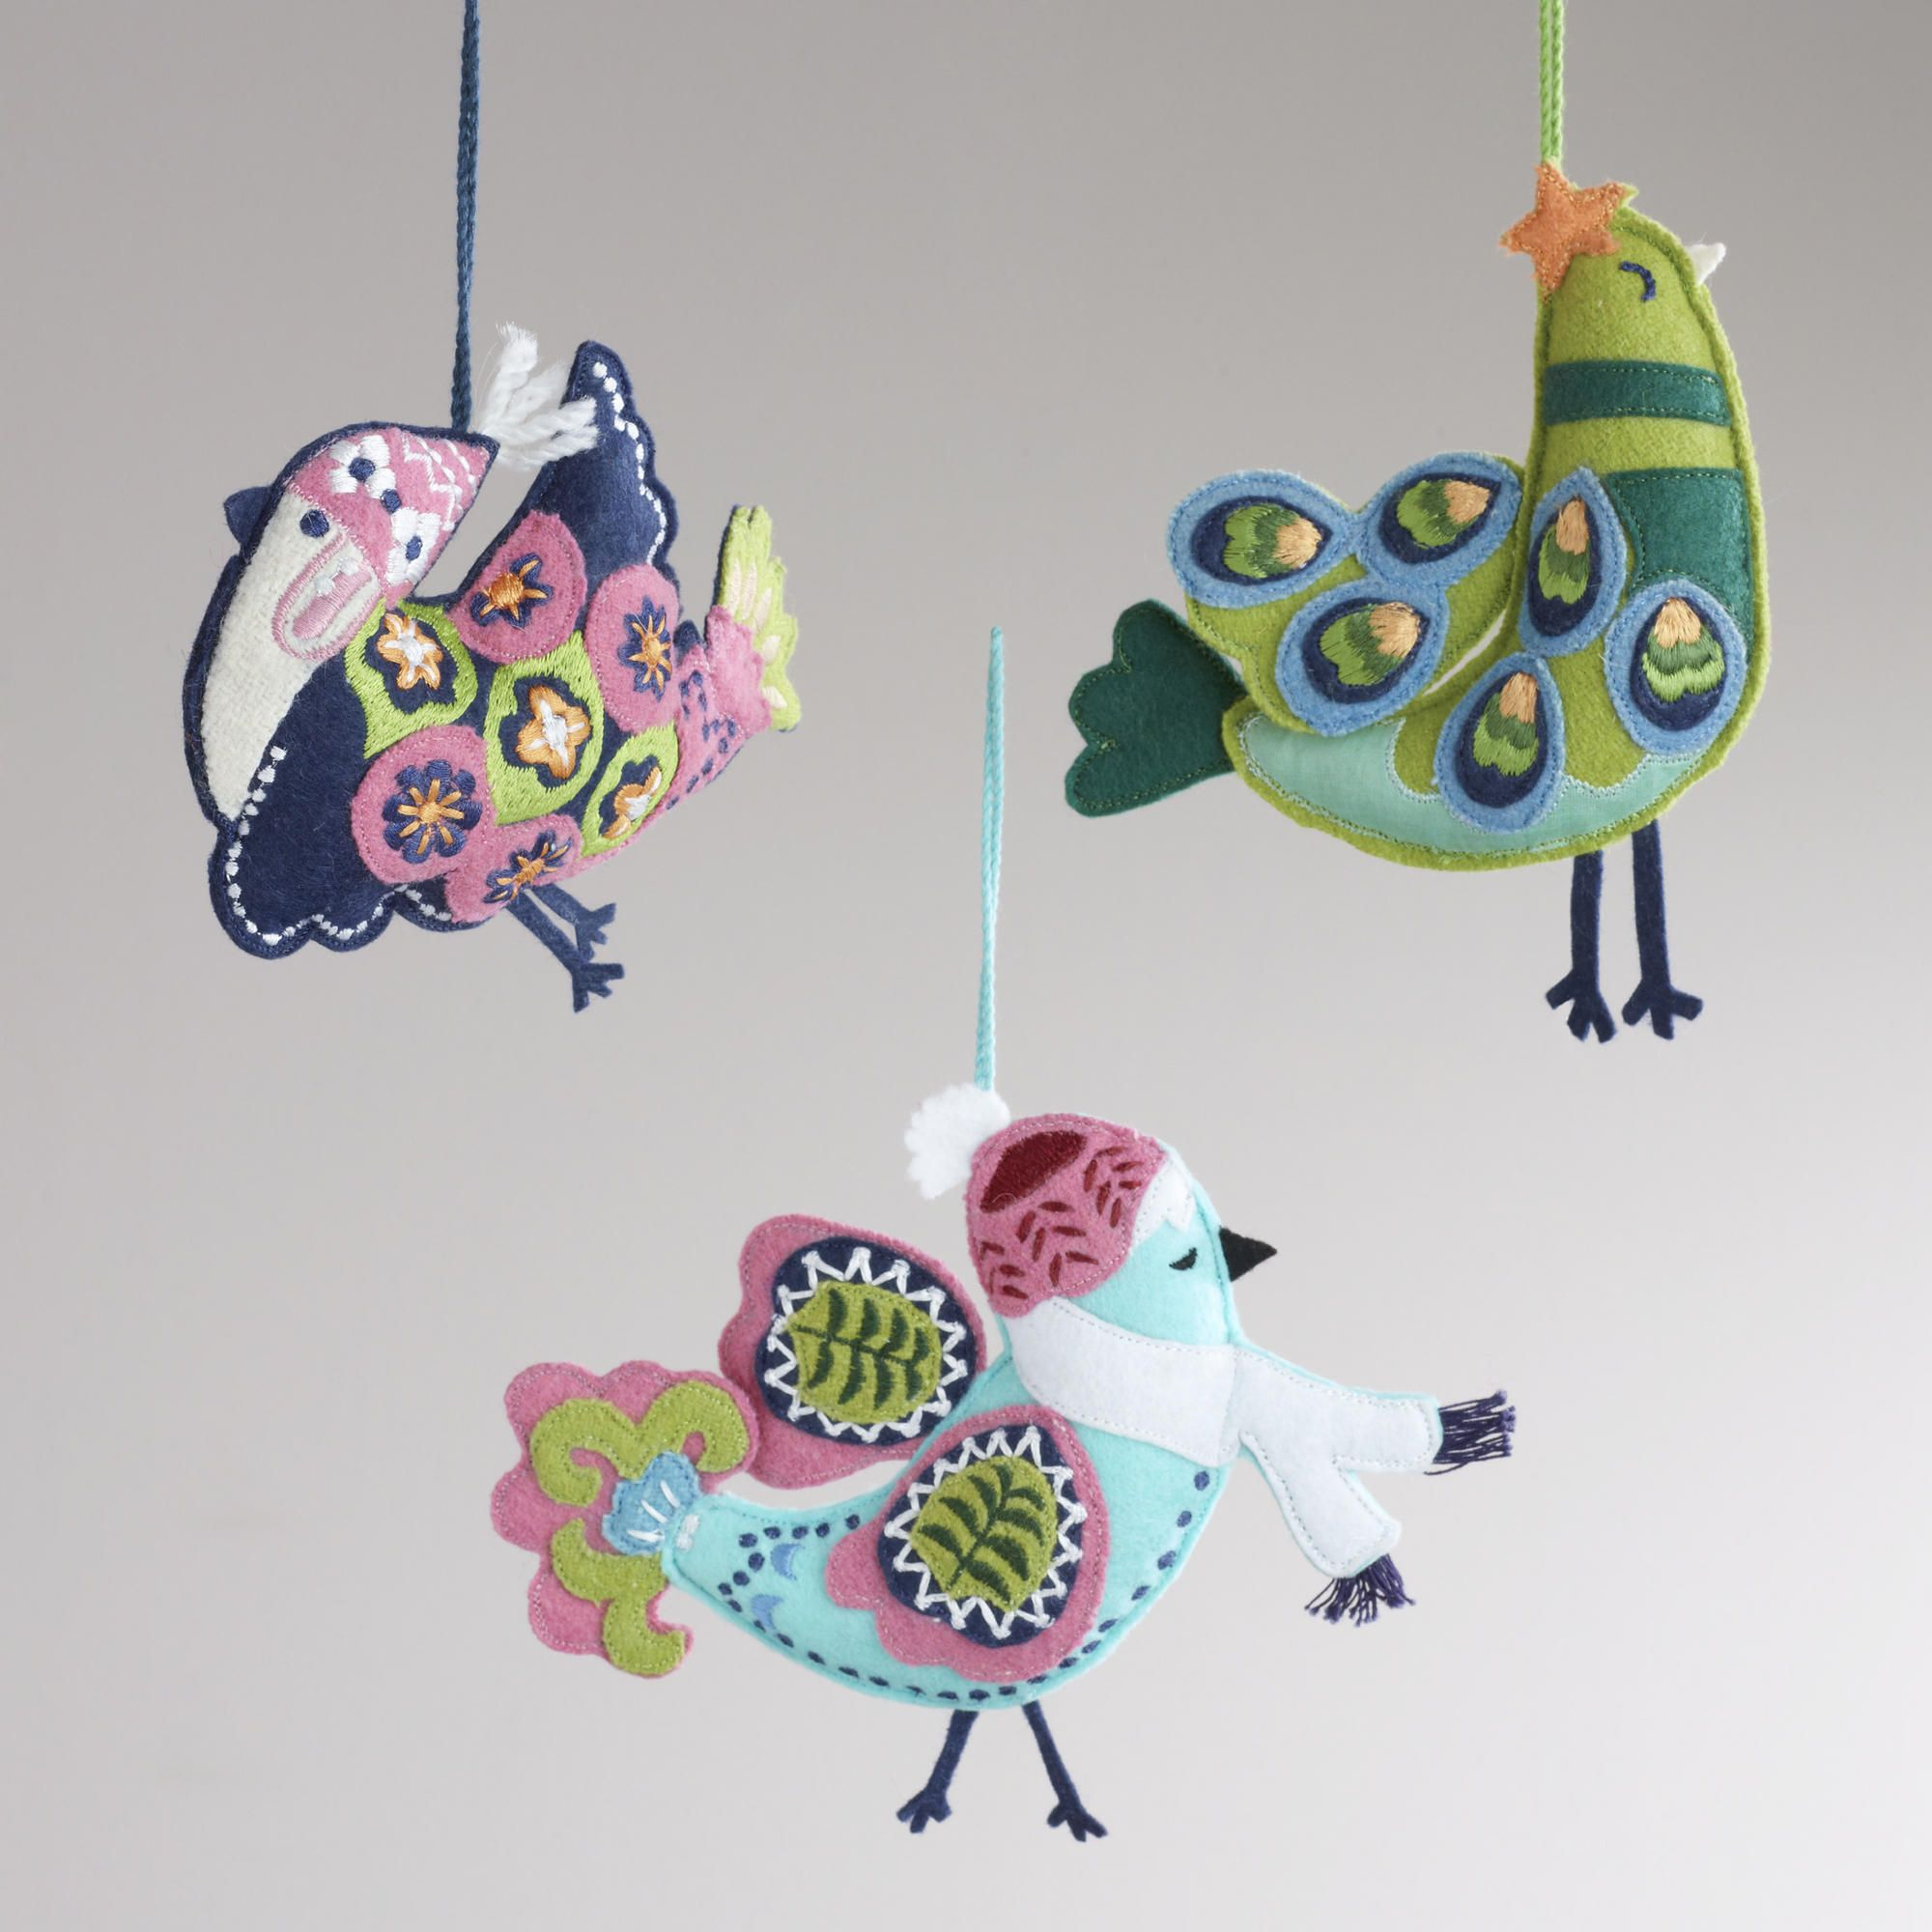 Embroidered Felt Cuckoo Bird Ornaments, Set Of 3 - World